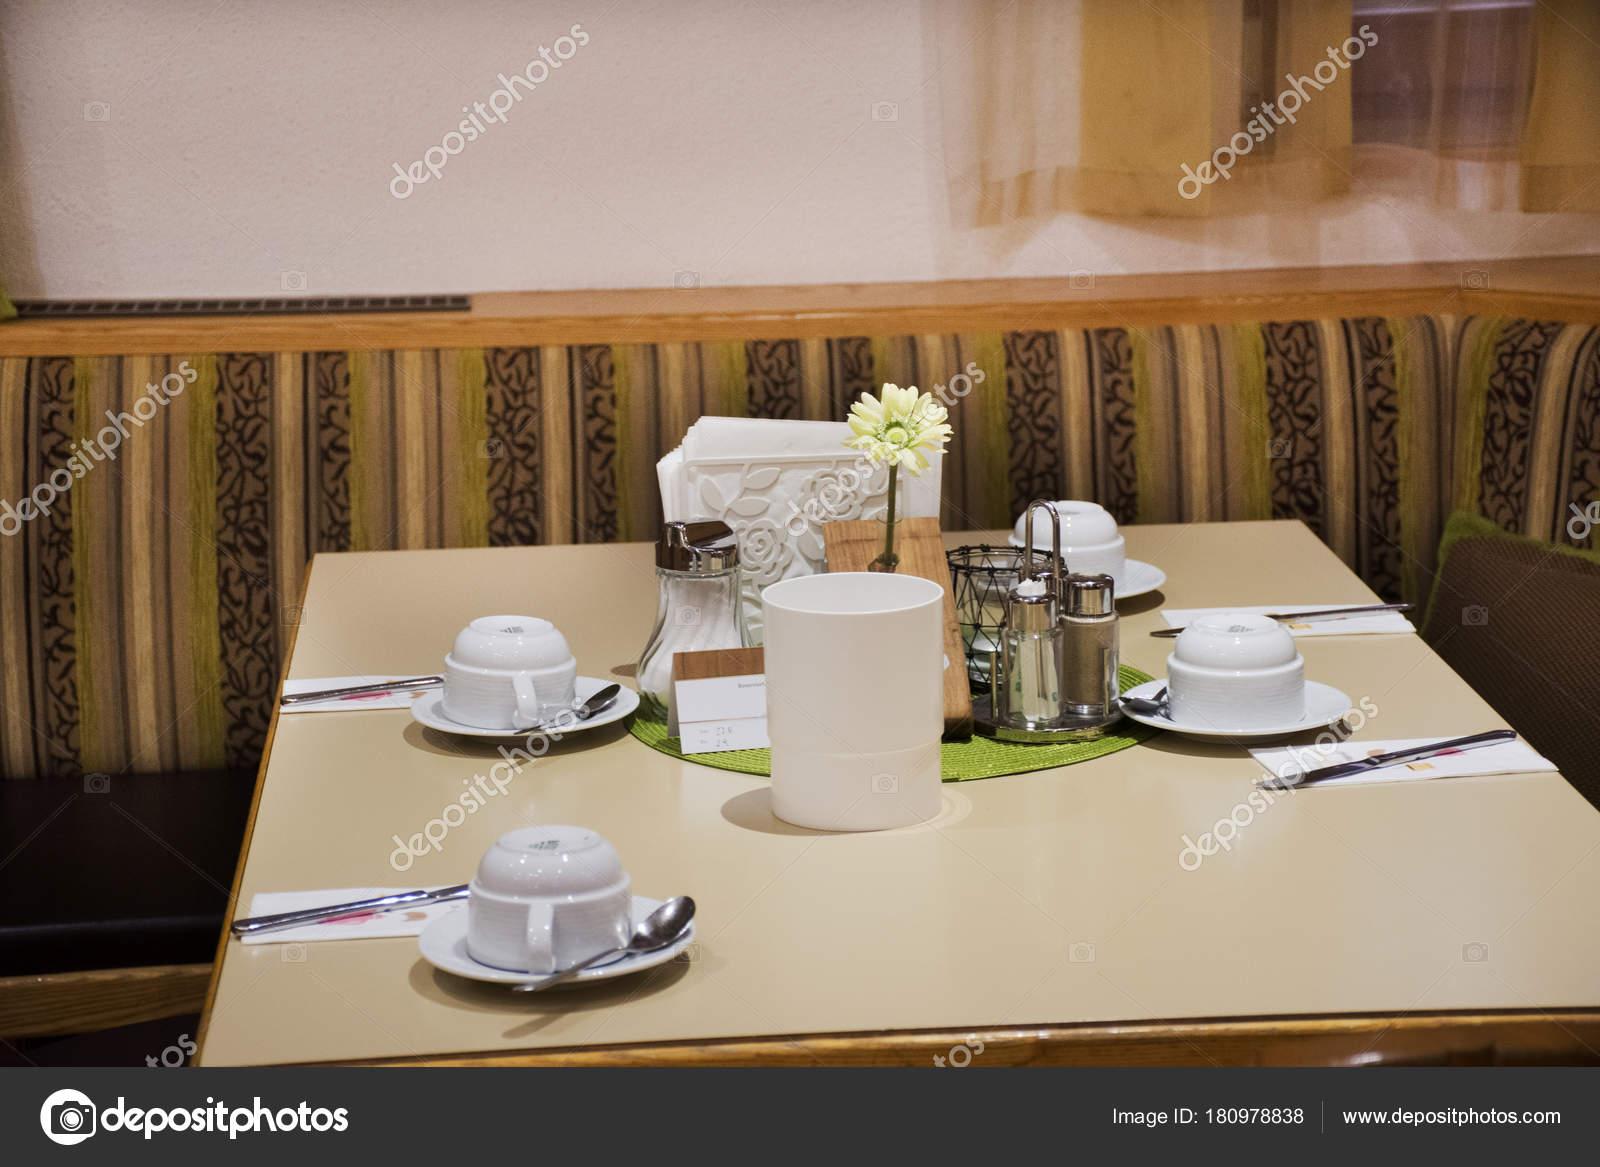 Comedores accesorios para comen en mesa de comedor en restaurante ...